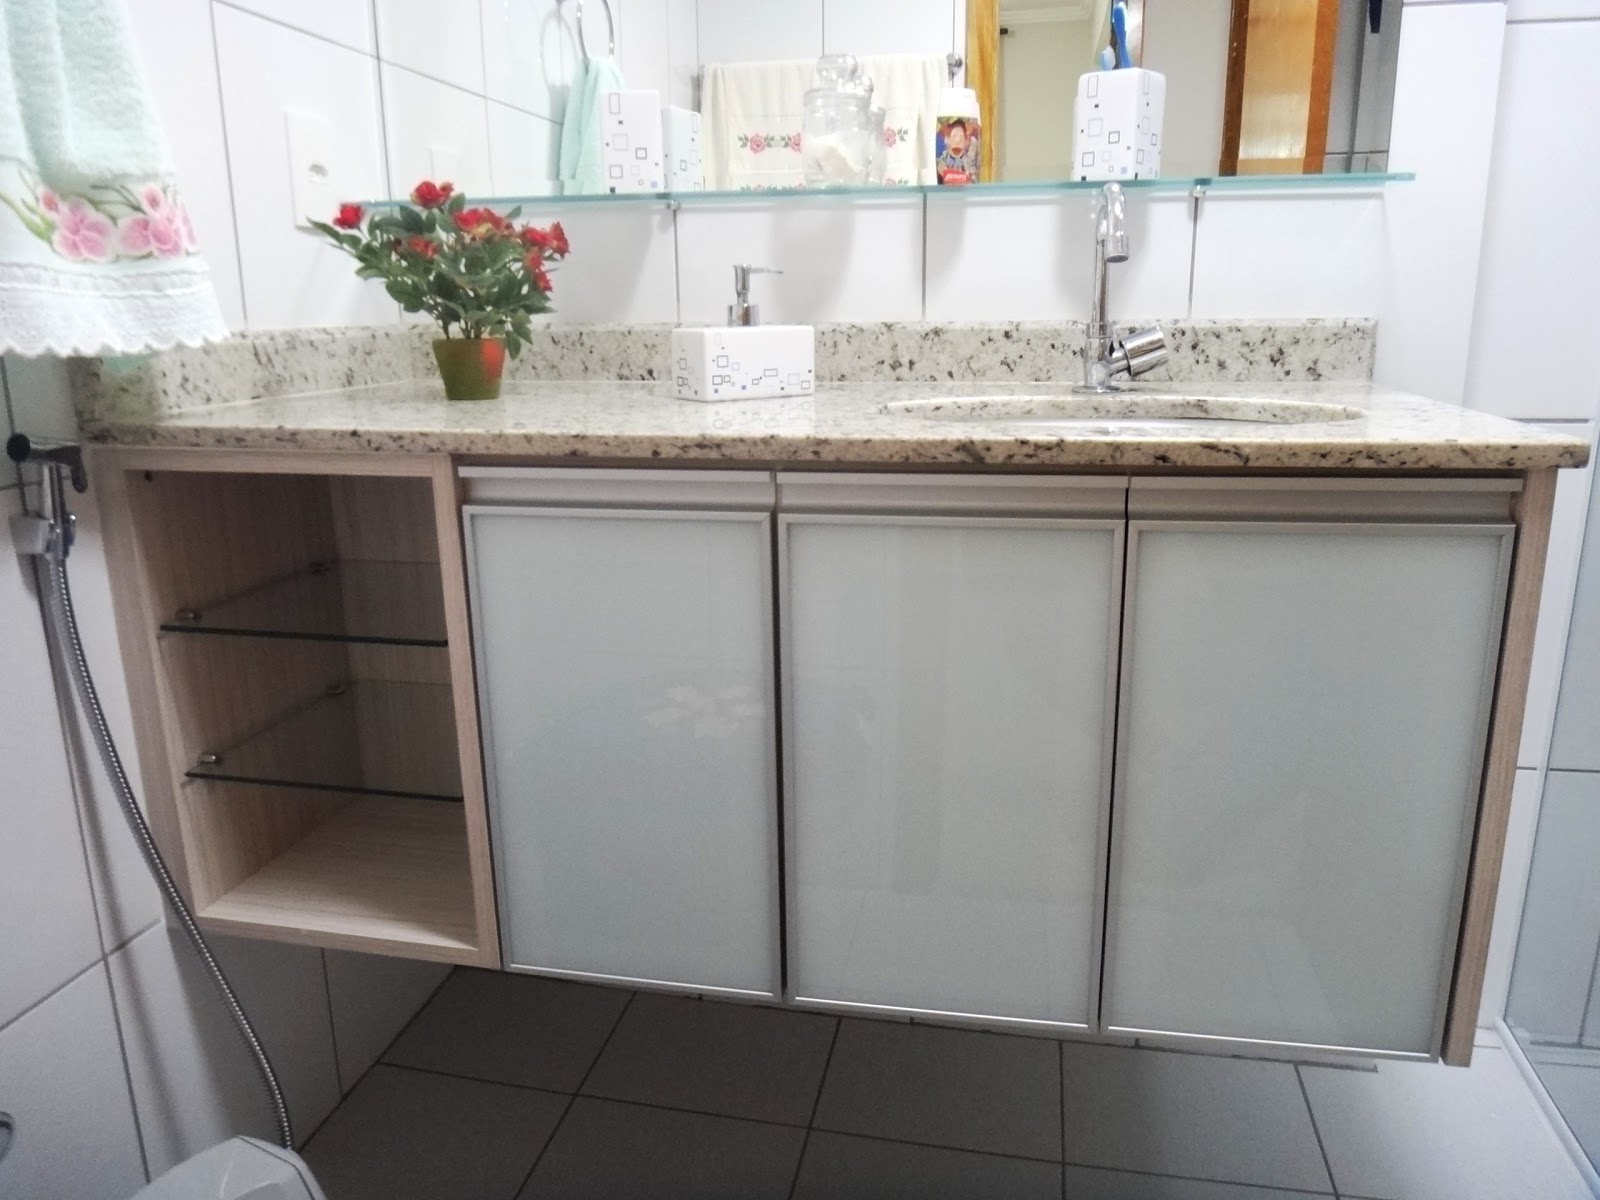 Belenetto Marcenaria Personalizada: Banheiros com portas de vidro e  #826549 1600x1200 Armario Banheiro Aluminio